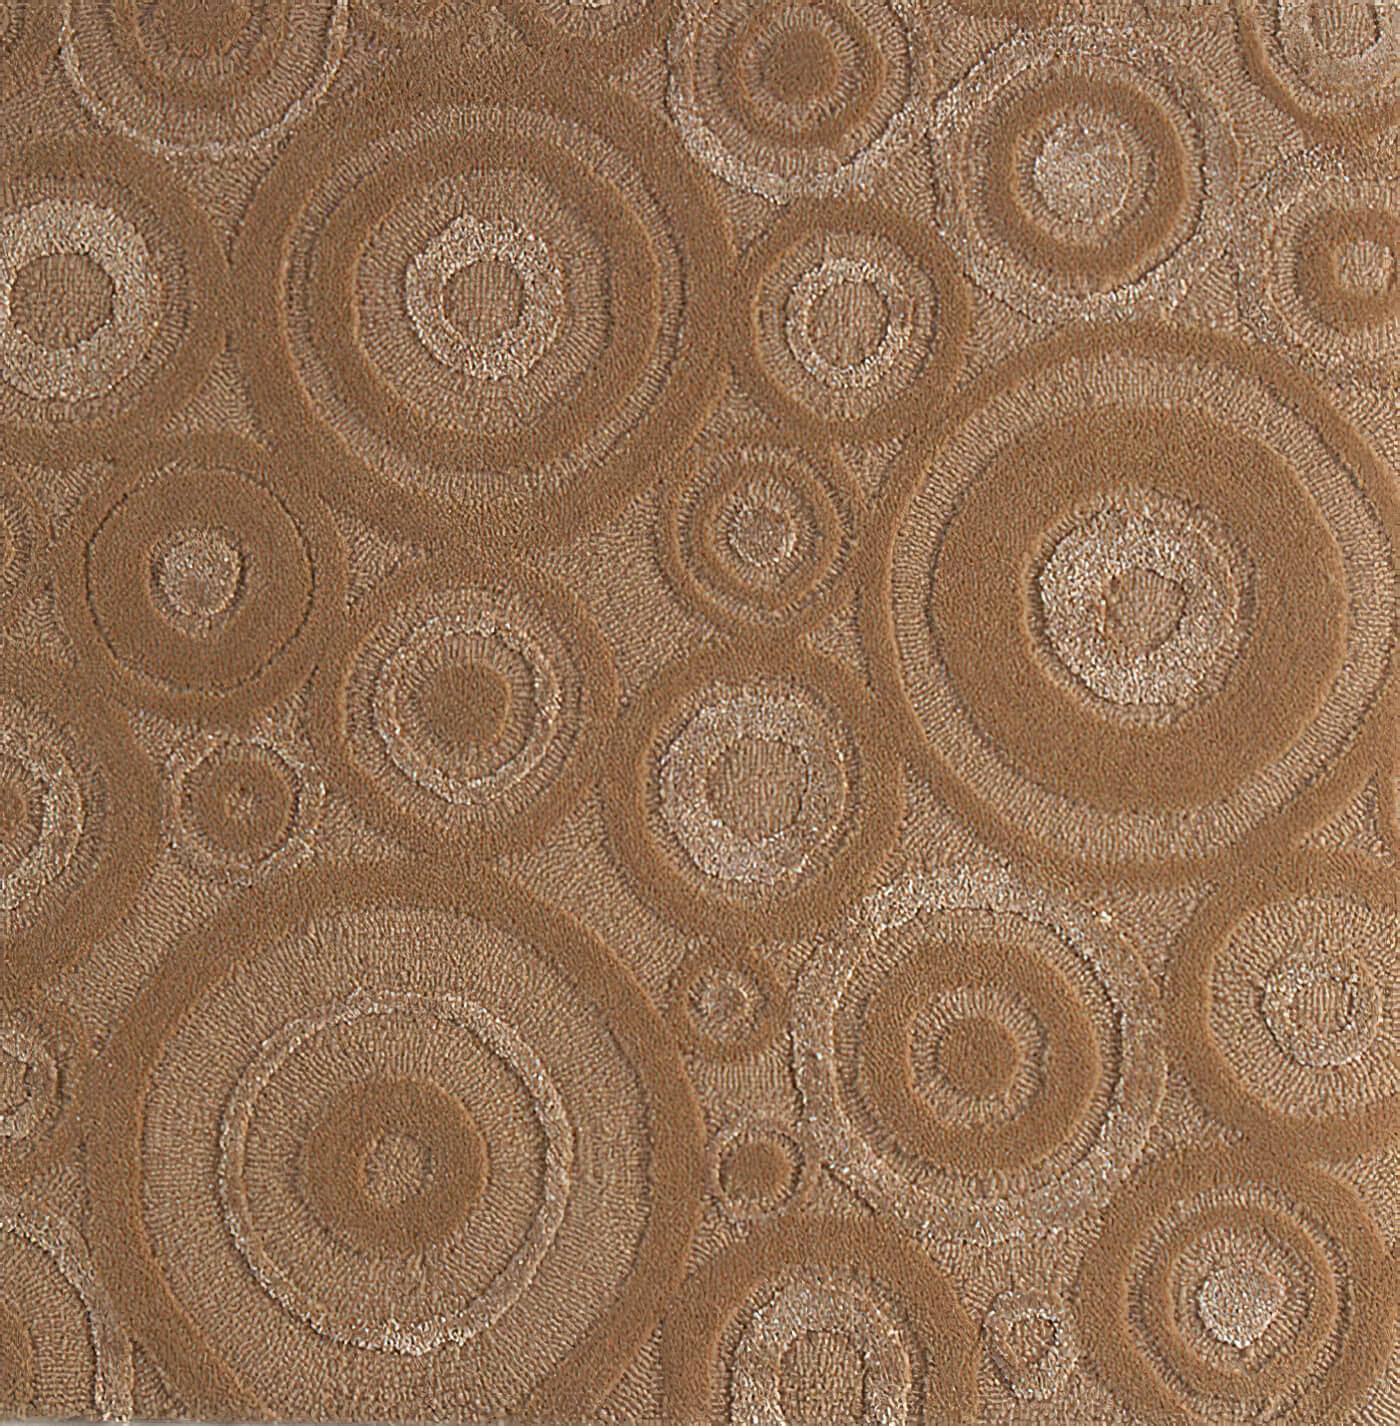 Silk Rugs and Silk Carpets 01